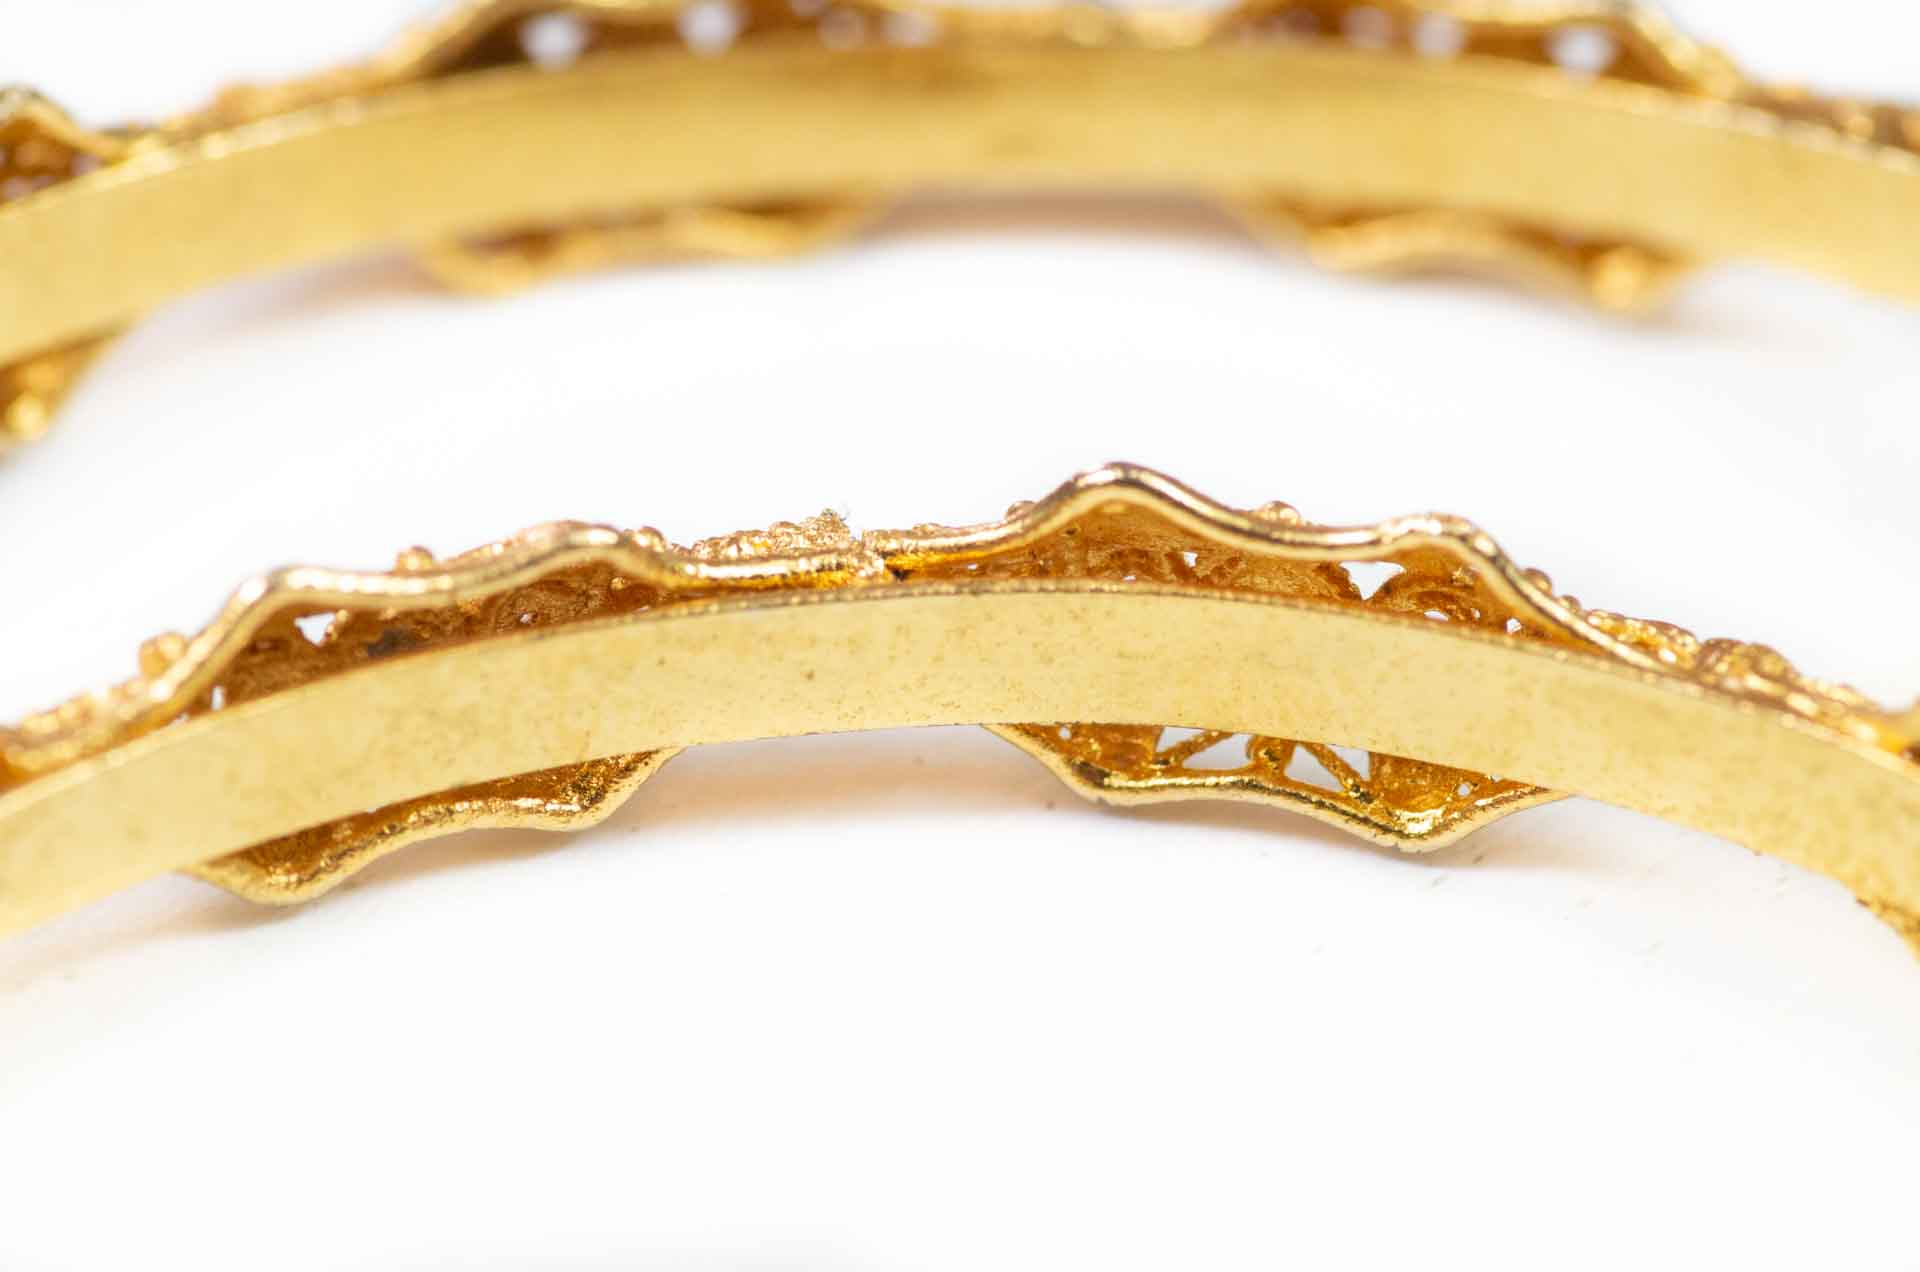 coppia di bracciali dorati 8